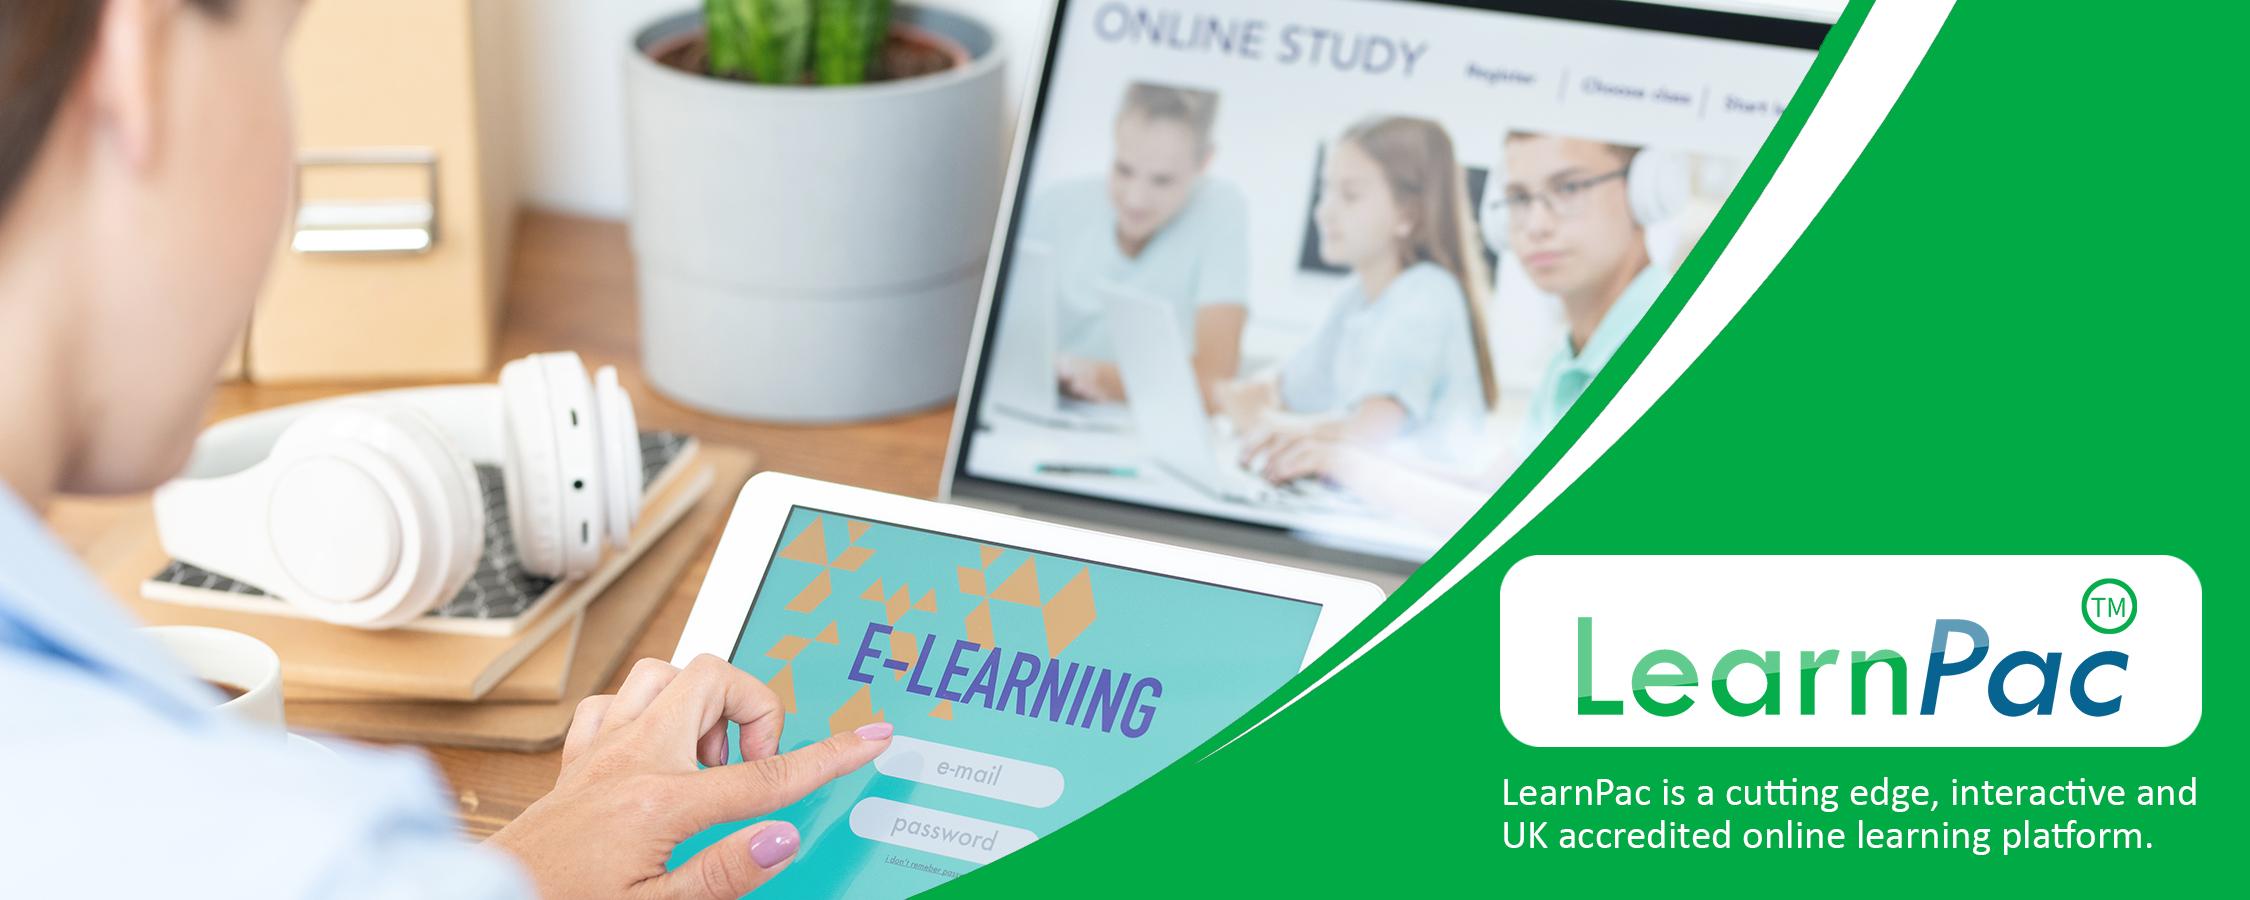 Personal Branding Training - Online Learning Courses - E-Learning Courses - LearnPac Systems UK -